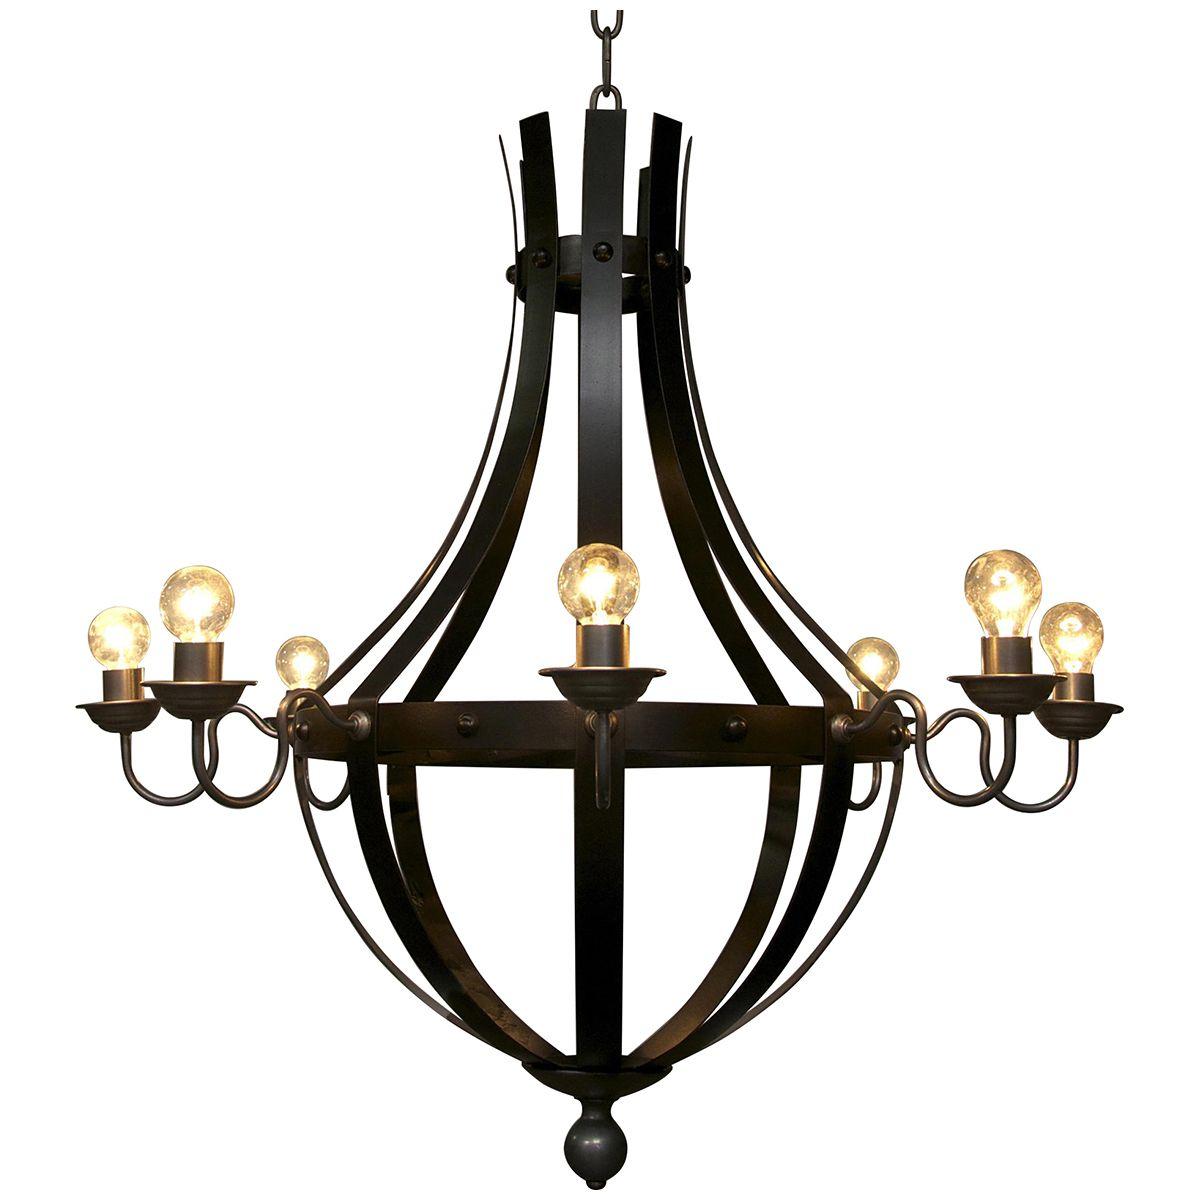 Noir Burg Chandelier LAMP309